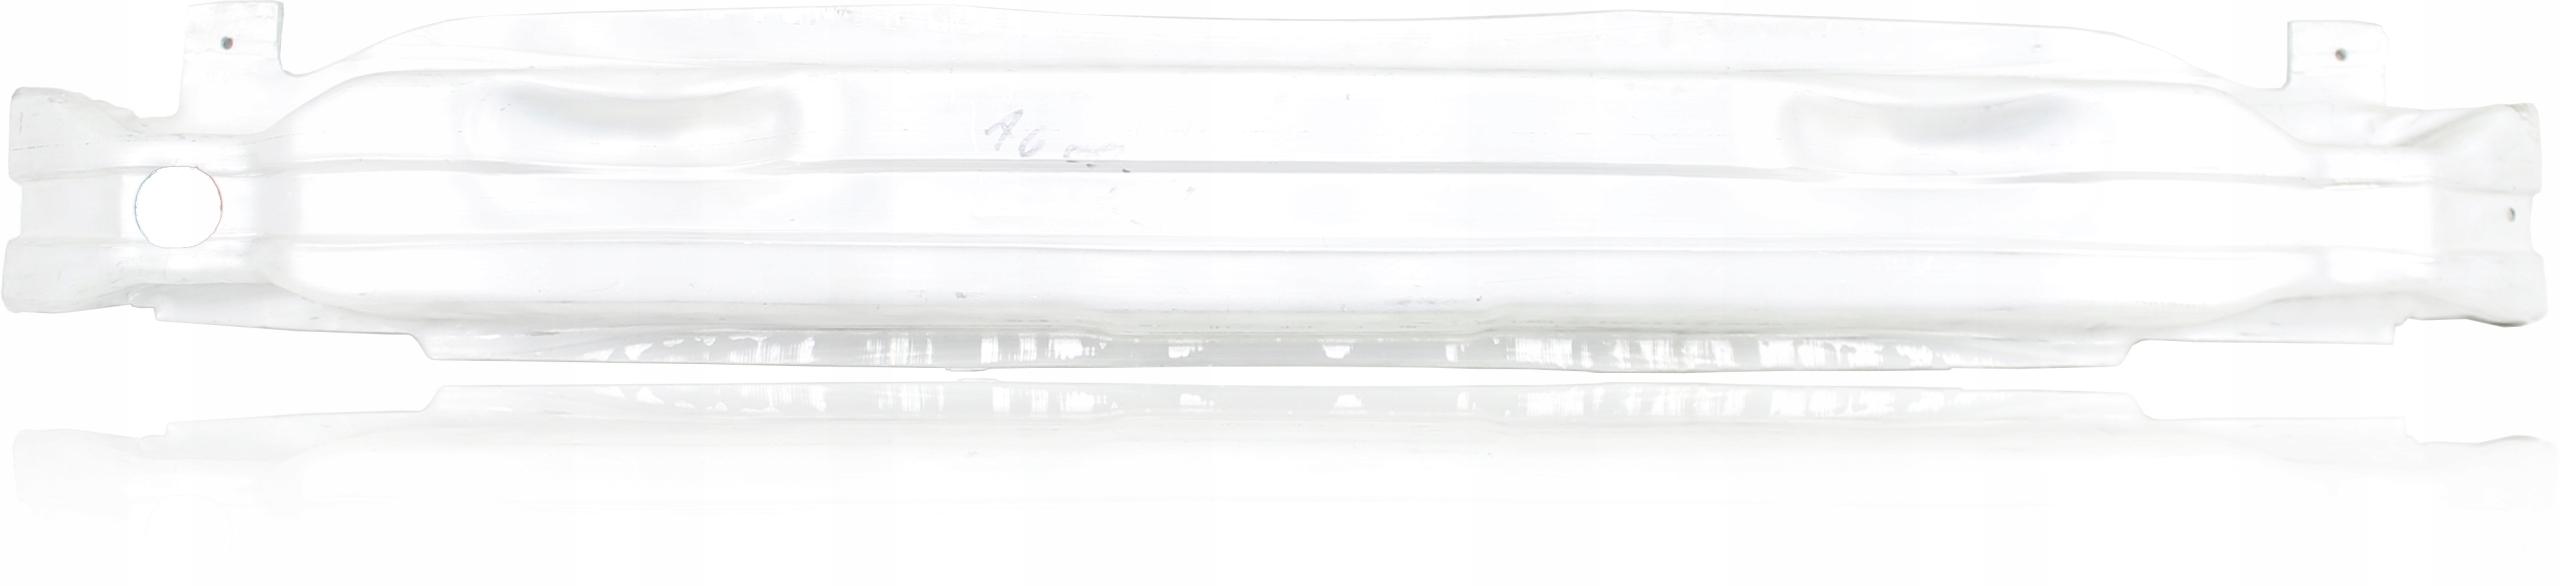 audi a6 c6 08-11 усиление бампера балка alu p